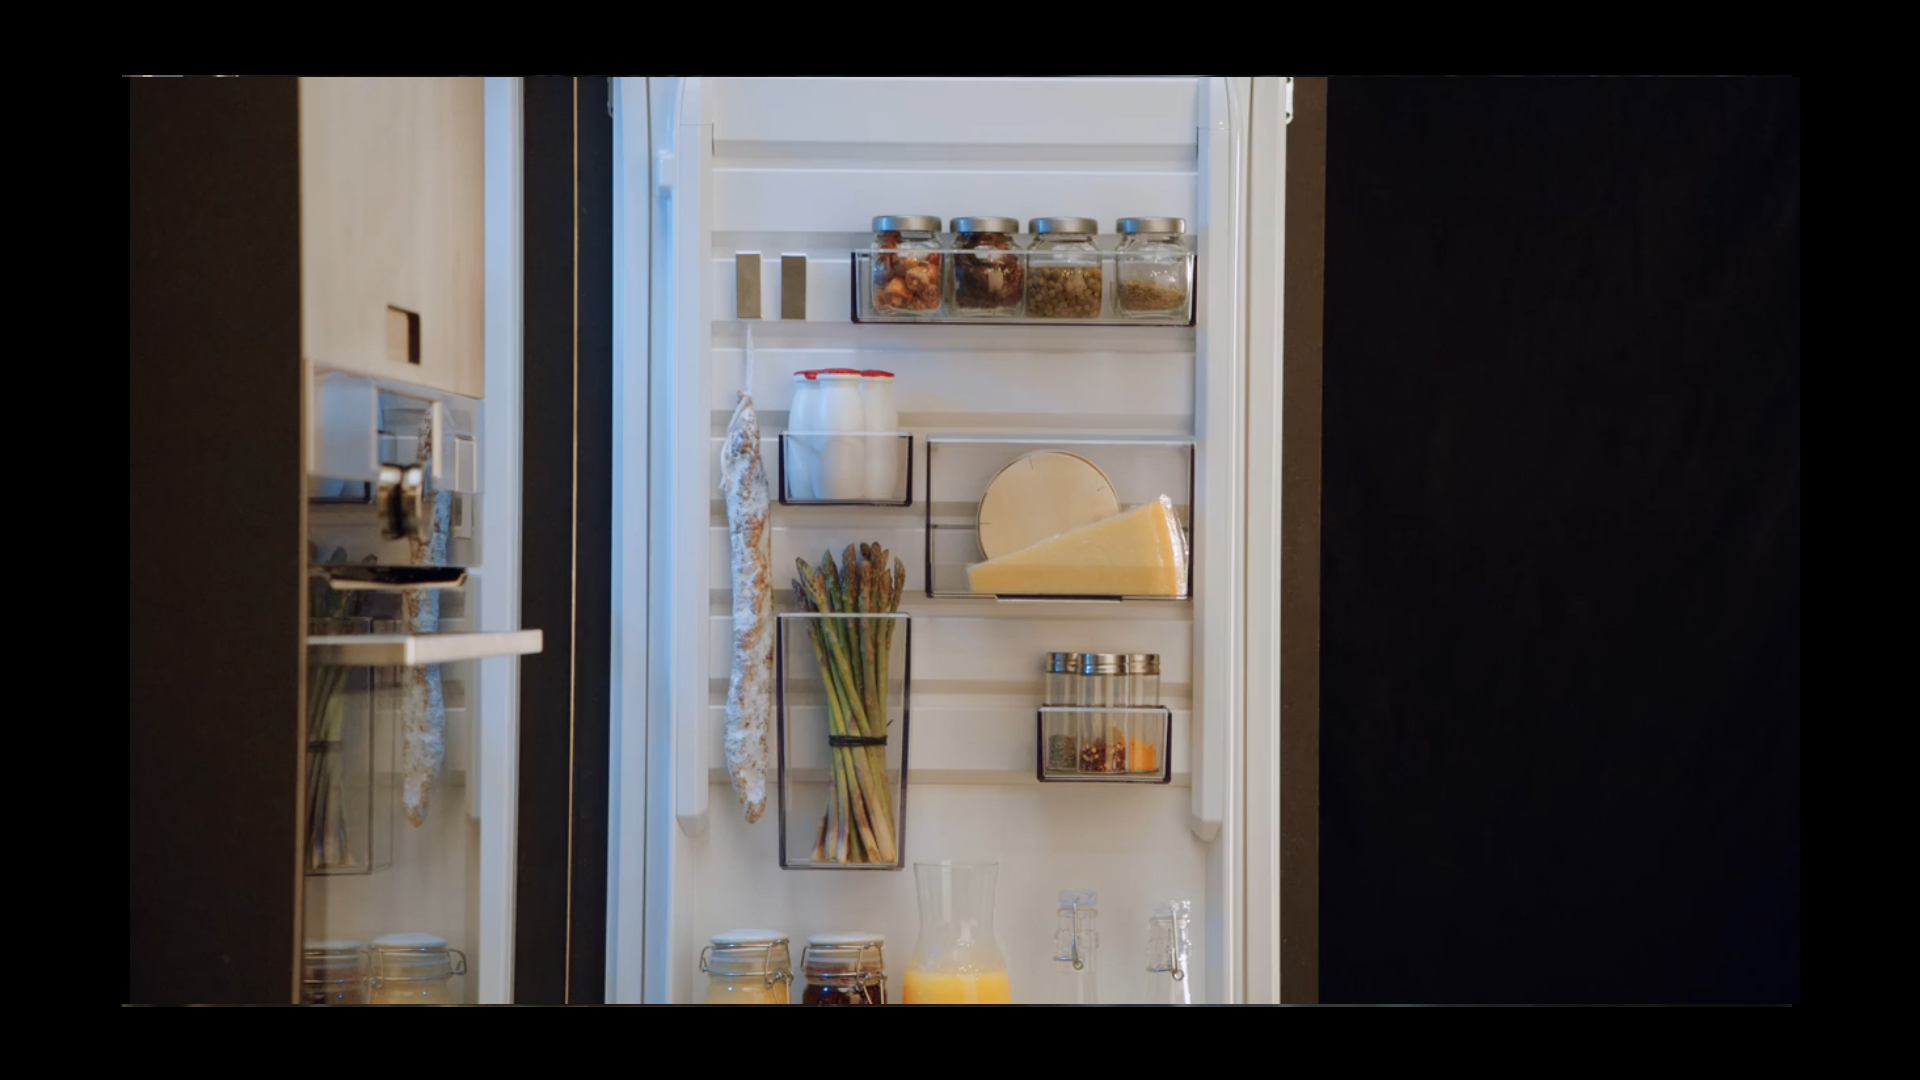 Aeg Kühlschrank Vitafresh : Aeg kühlschrank mit customflex elektrogeräte im raum mettmann